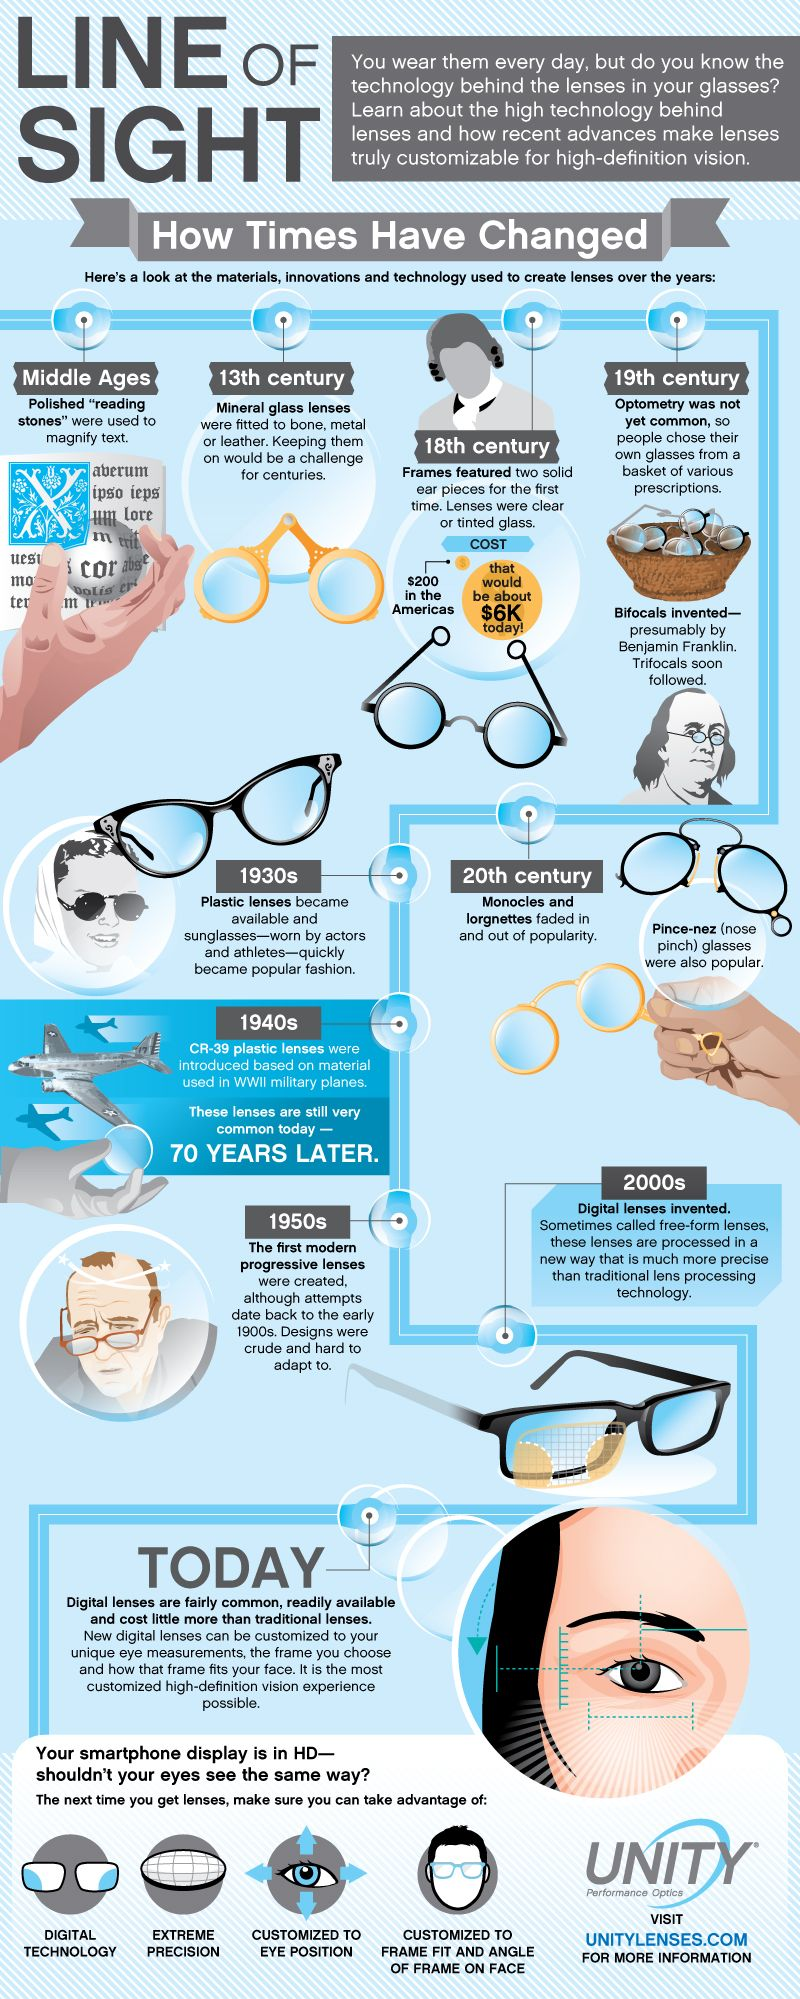 History of Eyeglasses Timeline | Timeline and History